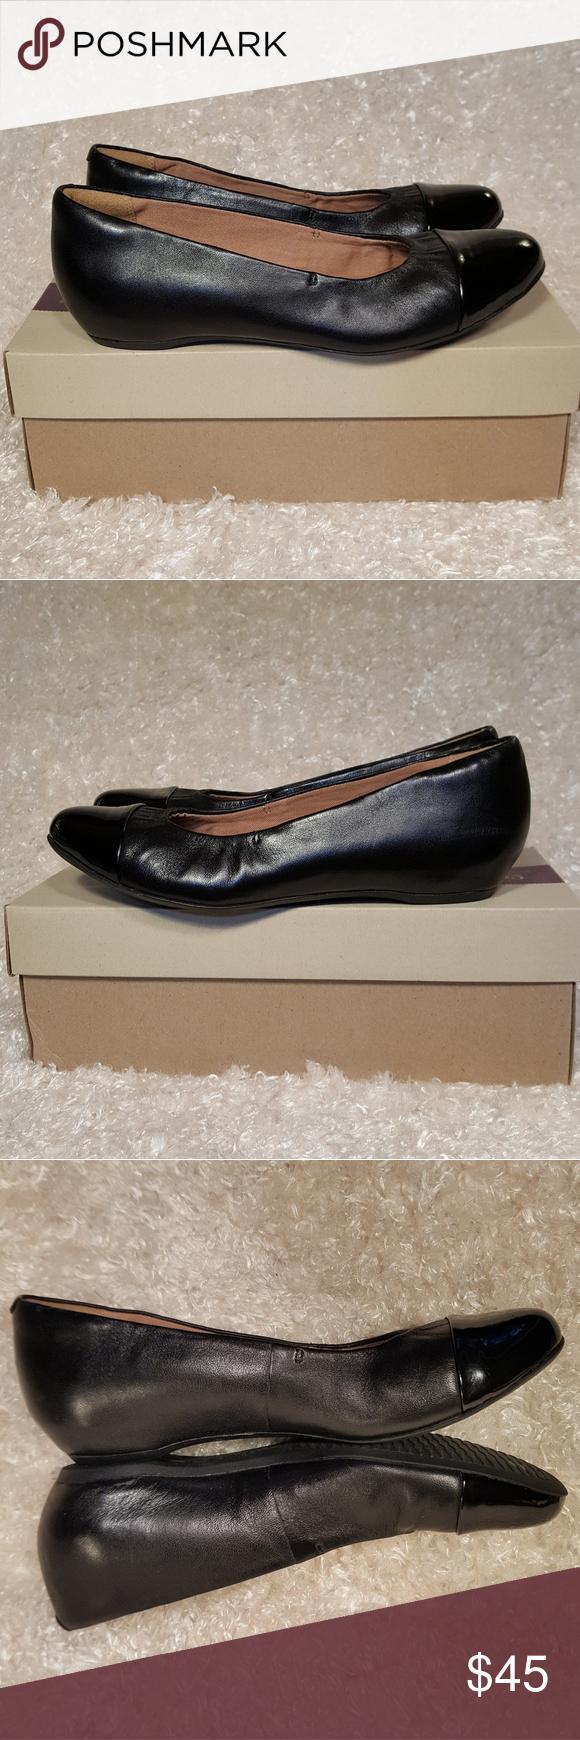 d6c84b31e3 Clarks Artisan Alitay Susan Black Leather Flats Clarks Artisan Collection Alitay  Susan Black Leather Flats Great pre-loved condition! With box.